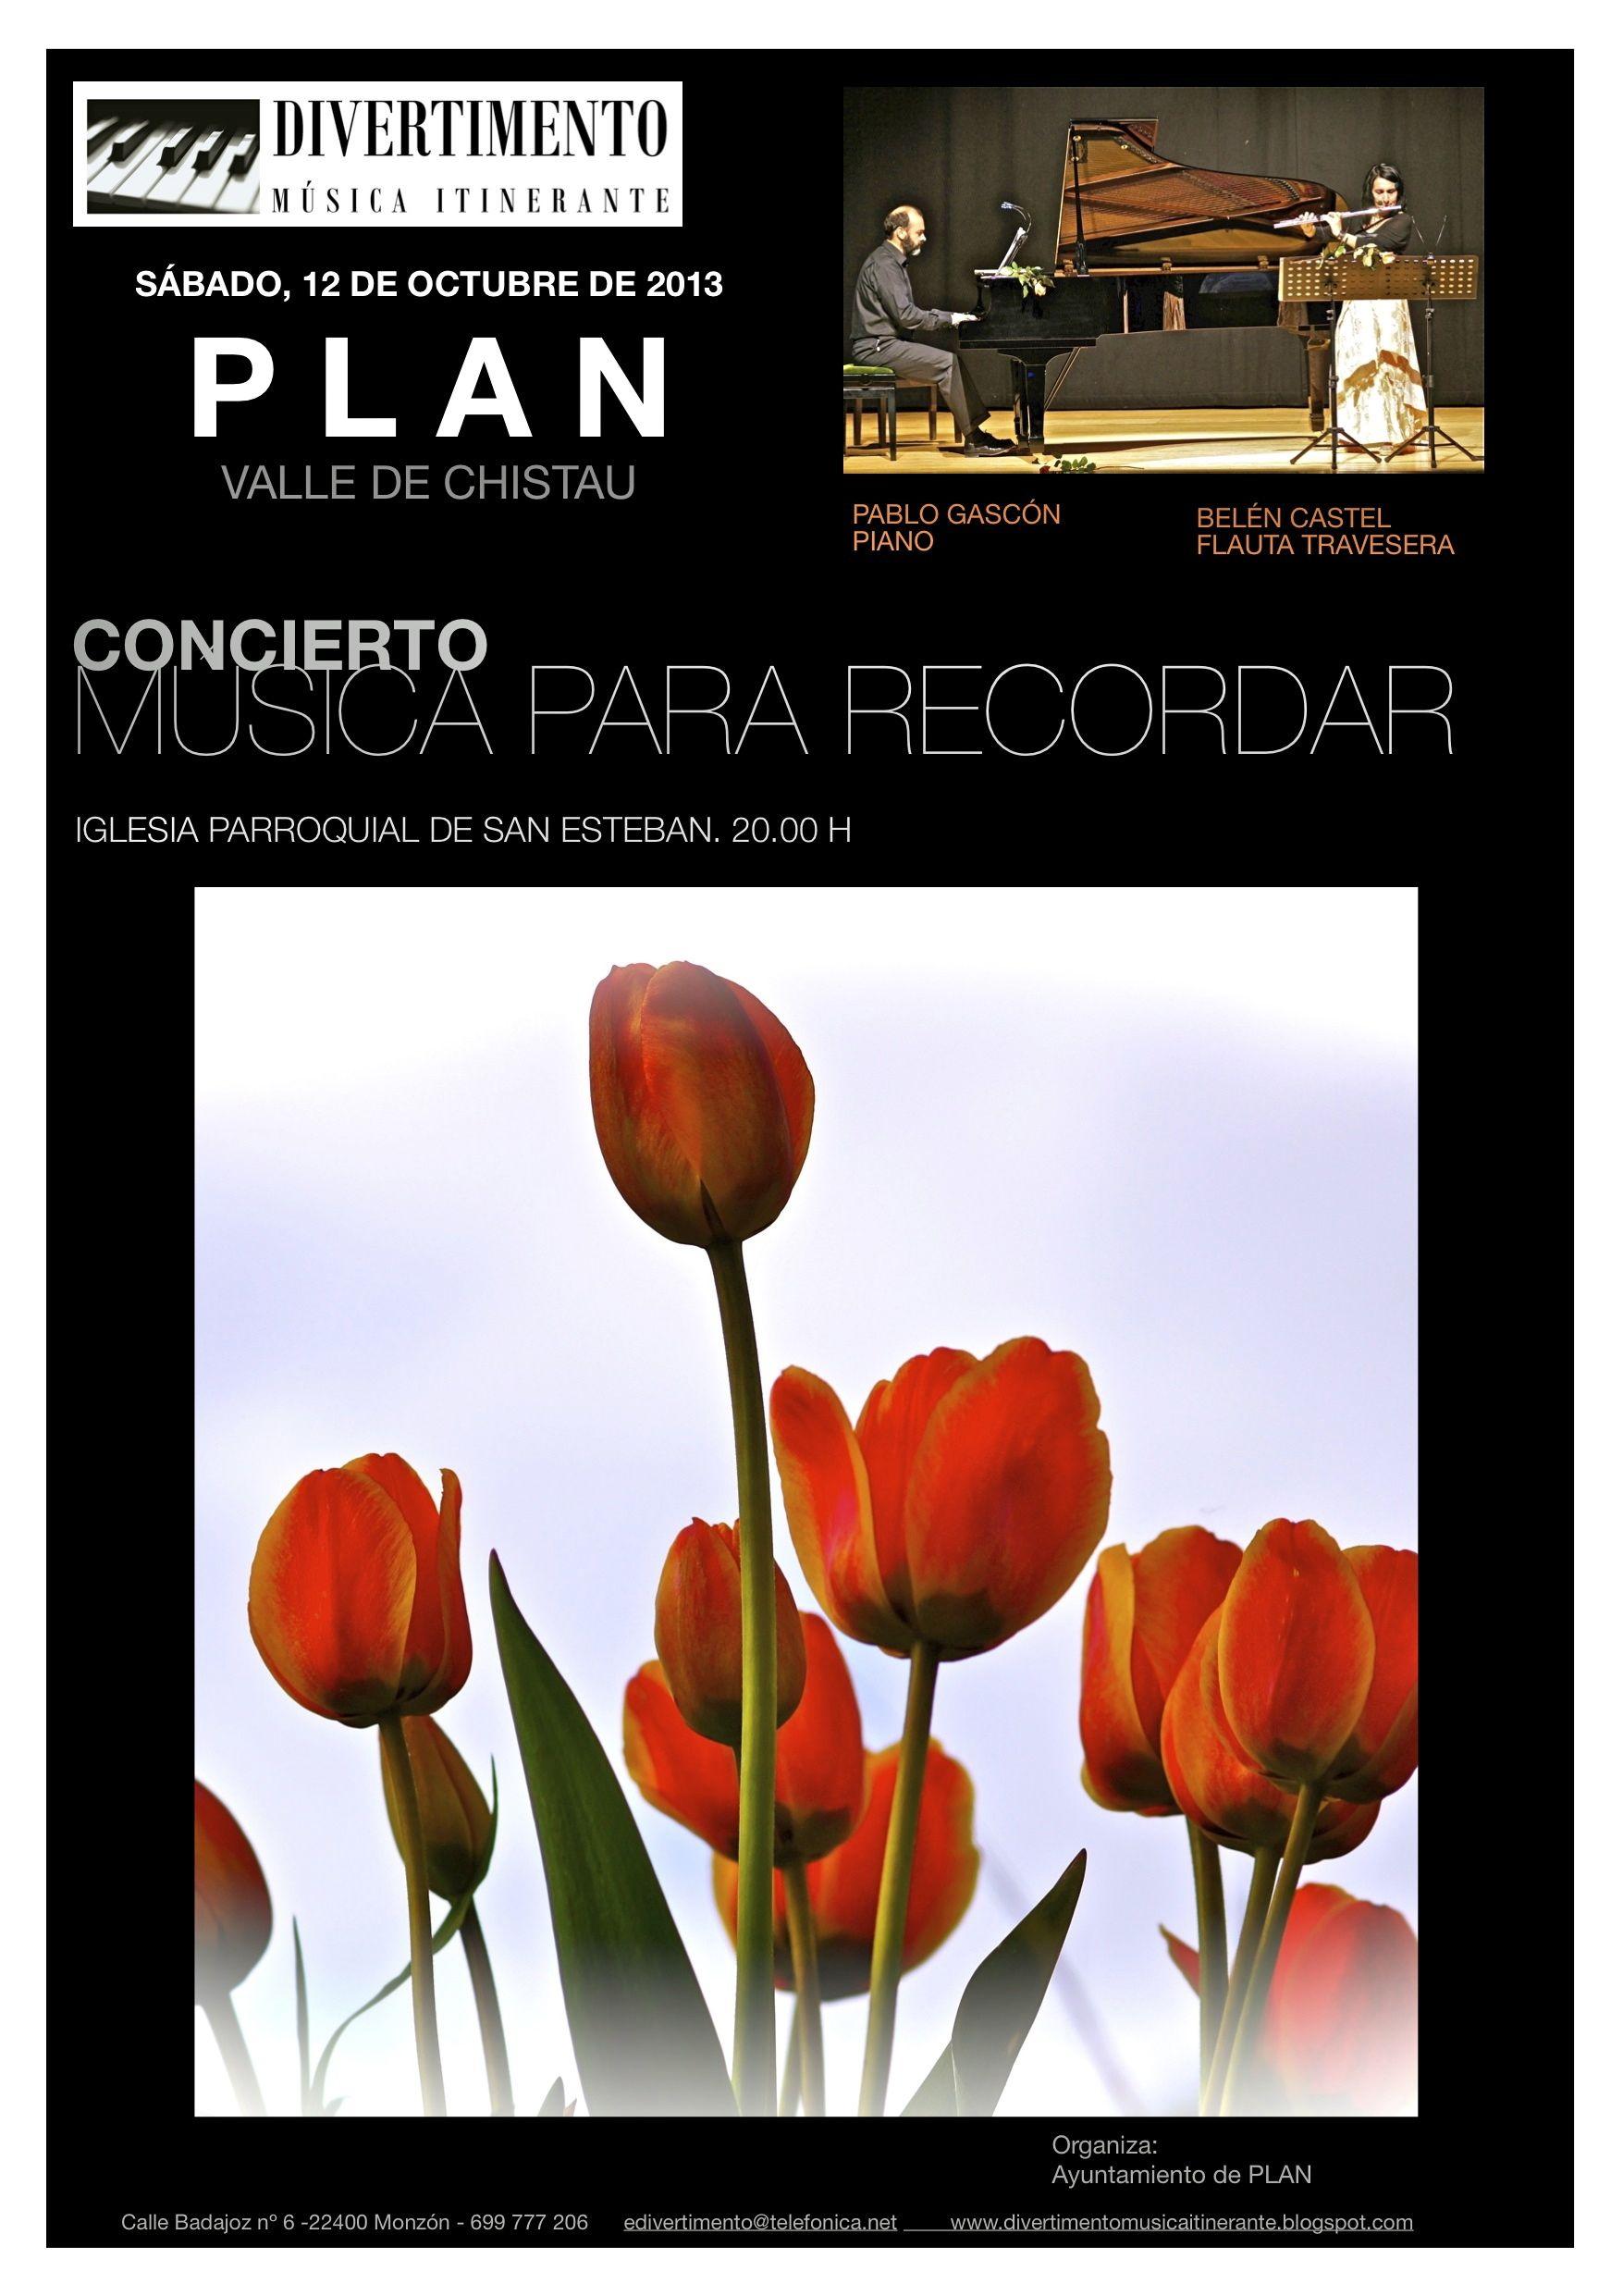 PLAN 2013 MUSICA PARA RECORDAR (1)